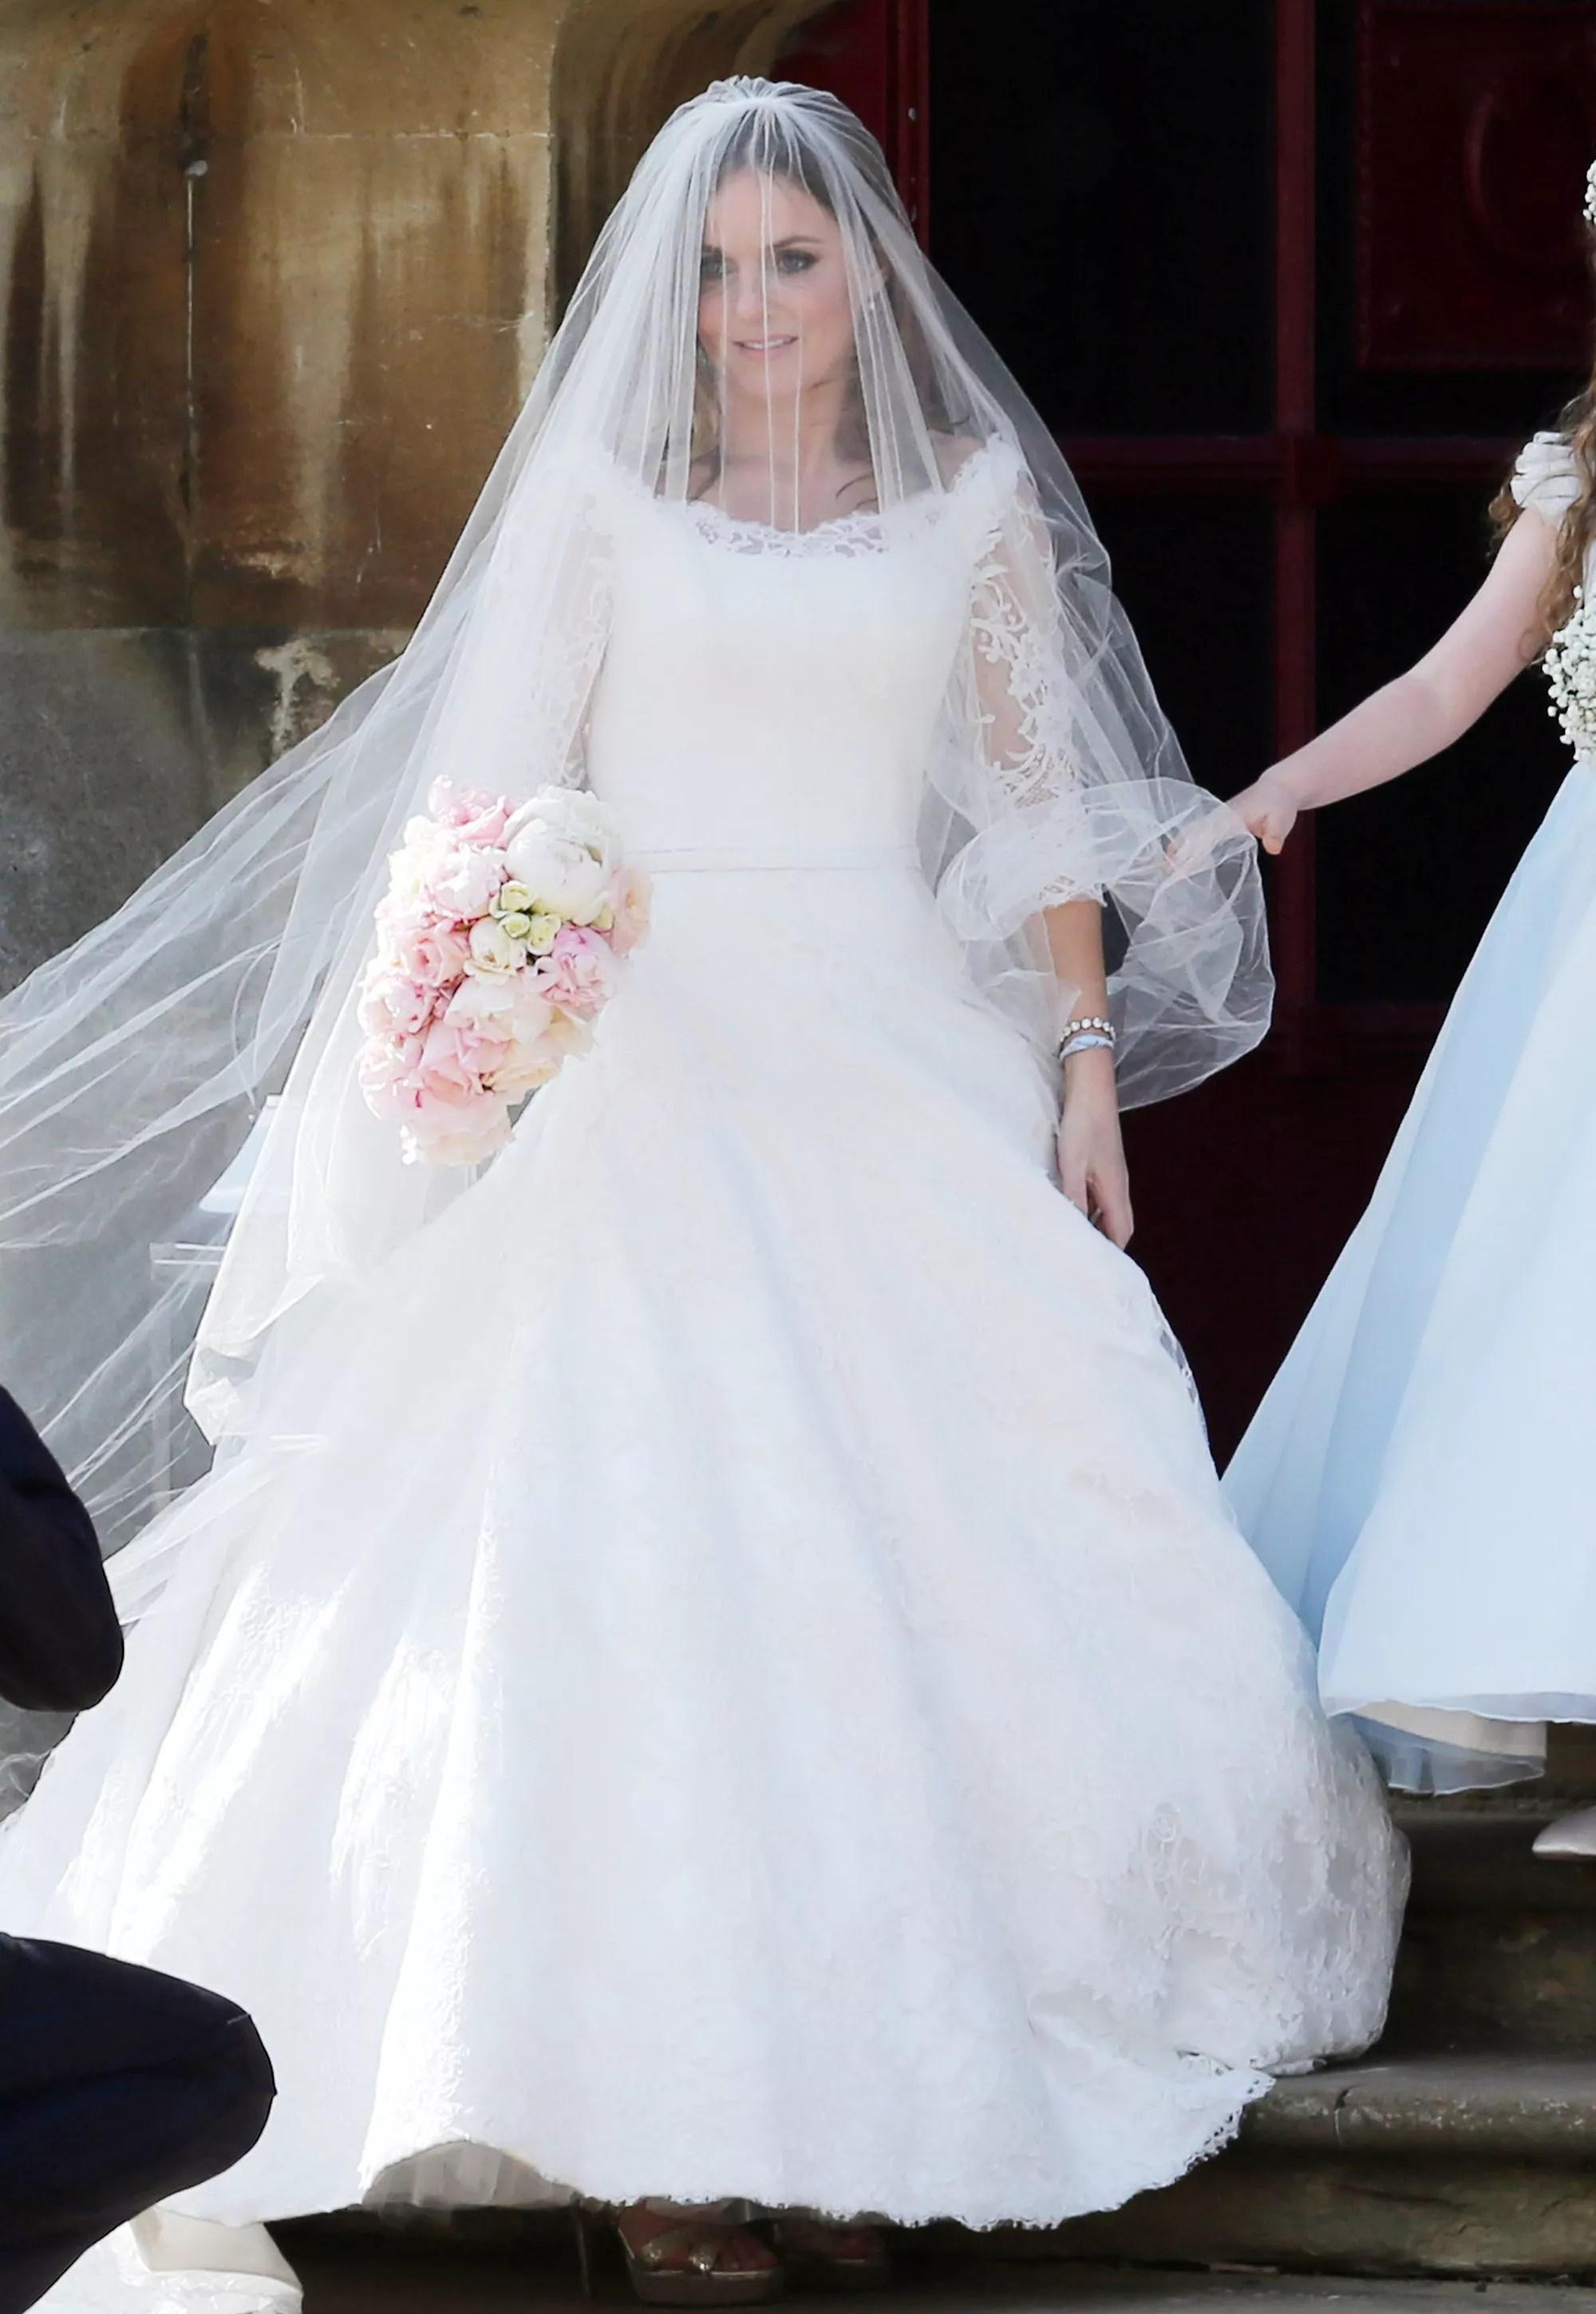 See Ginger Spice Geri Halliwells Wedding Dress